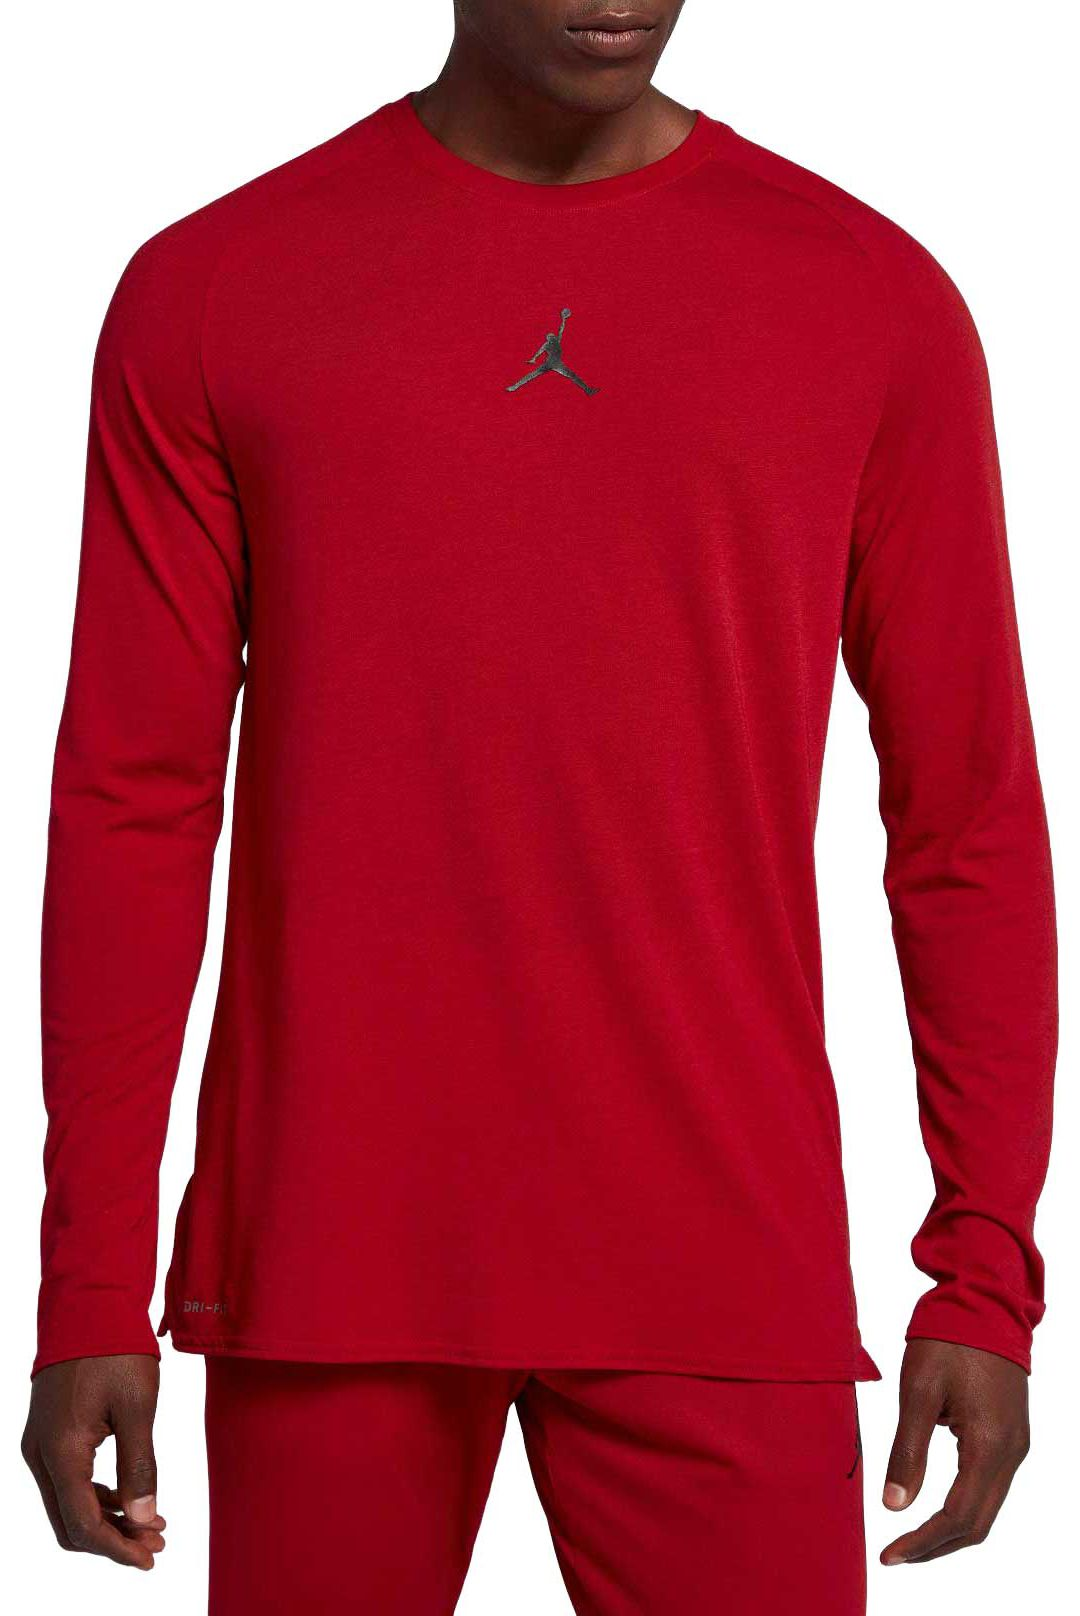 8a4d017f41 Jordan Men's Dry 23 Alpha Long Sleeve Shirt